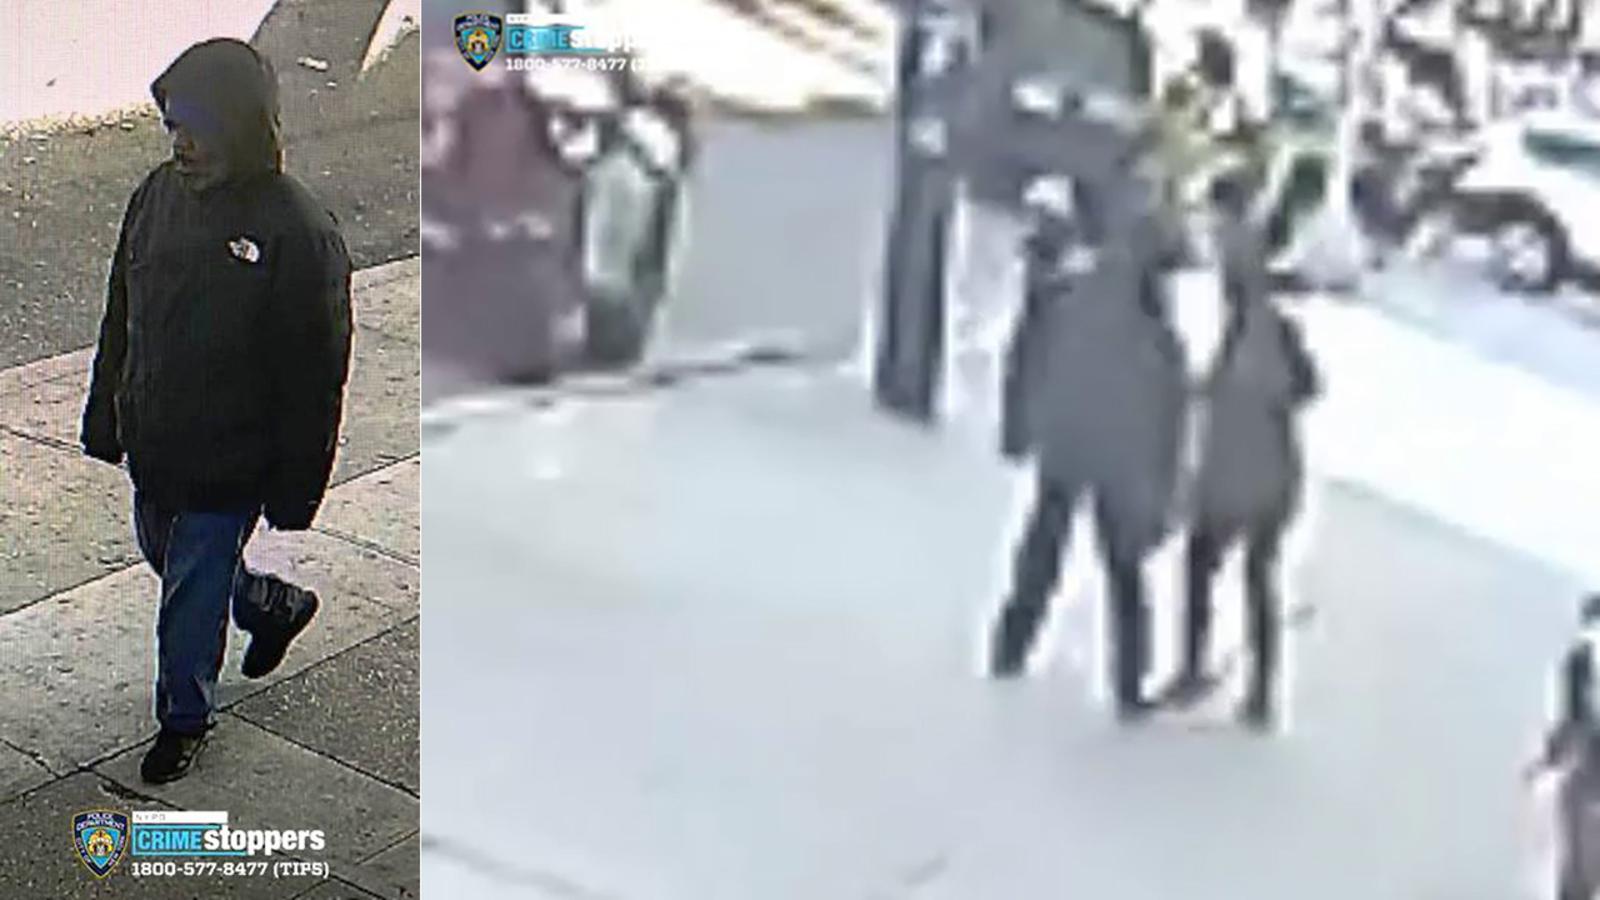 35-year-old woman randomly groped by man on Brooklyn street